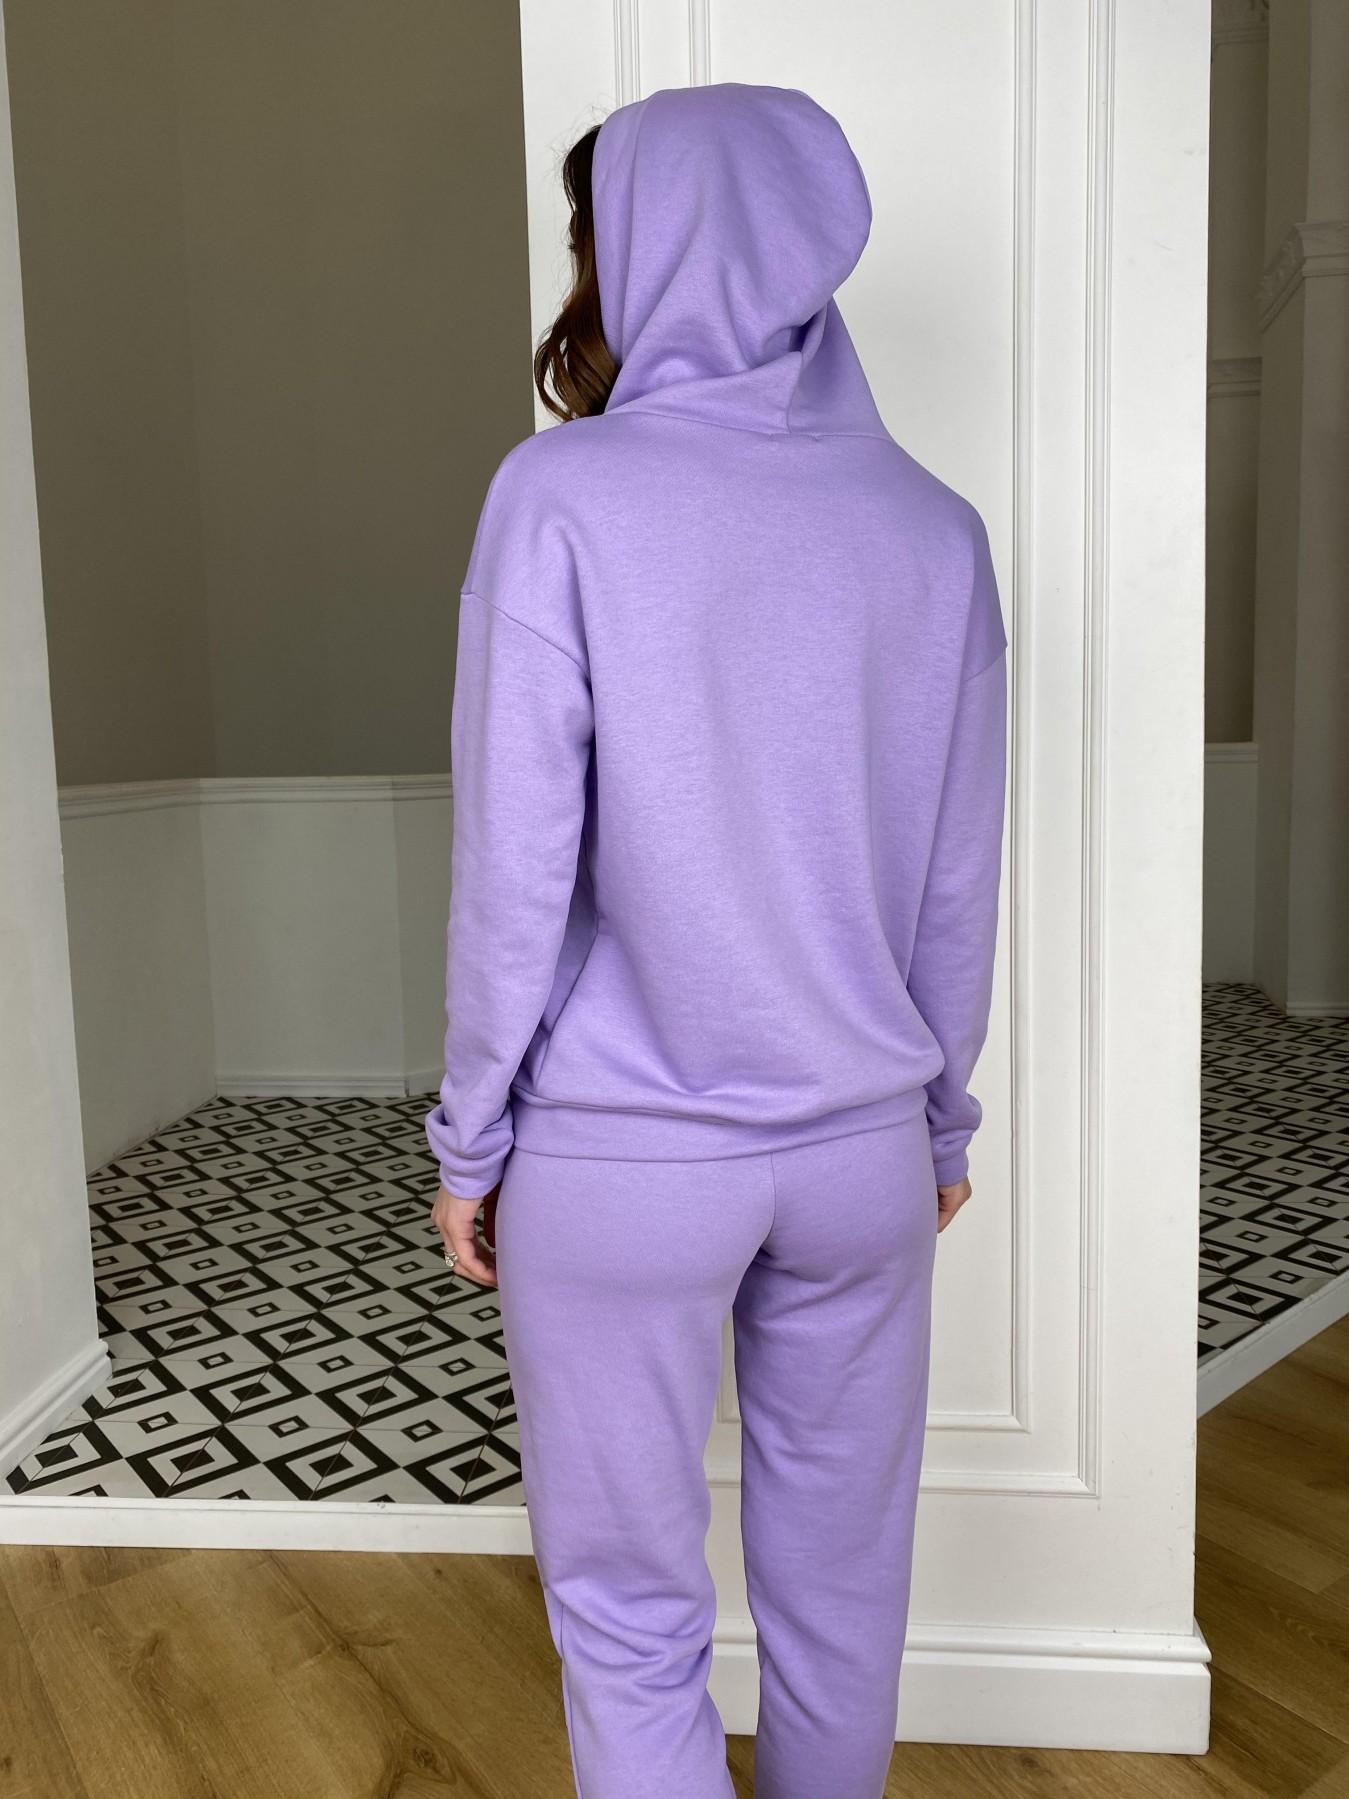 Бруклин костюм из 3х нитки  10579 АРТ. 46935 Цвет: Лаванда - фото 10, интернет магазин tm-modus.ru